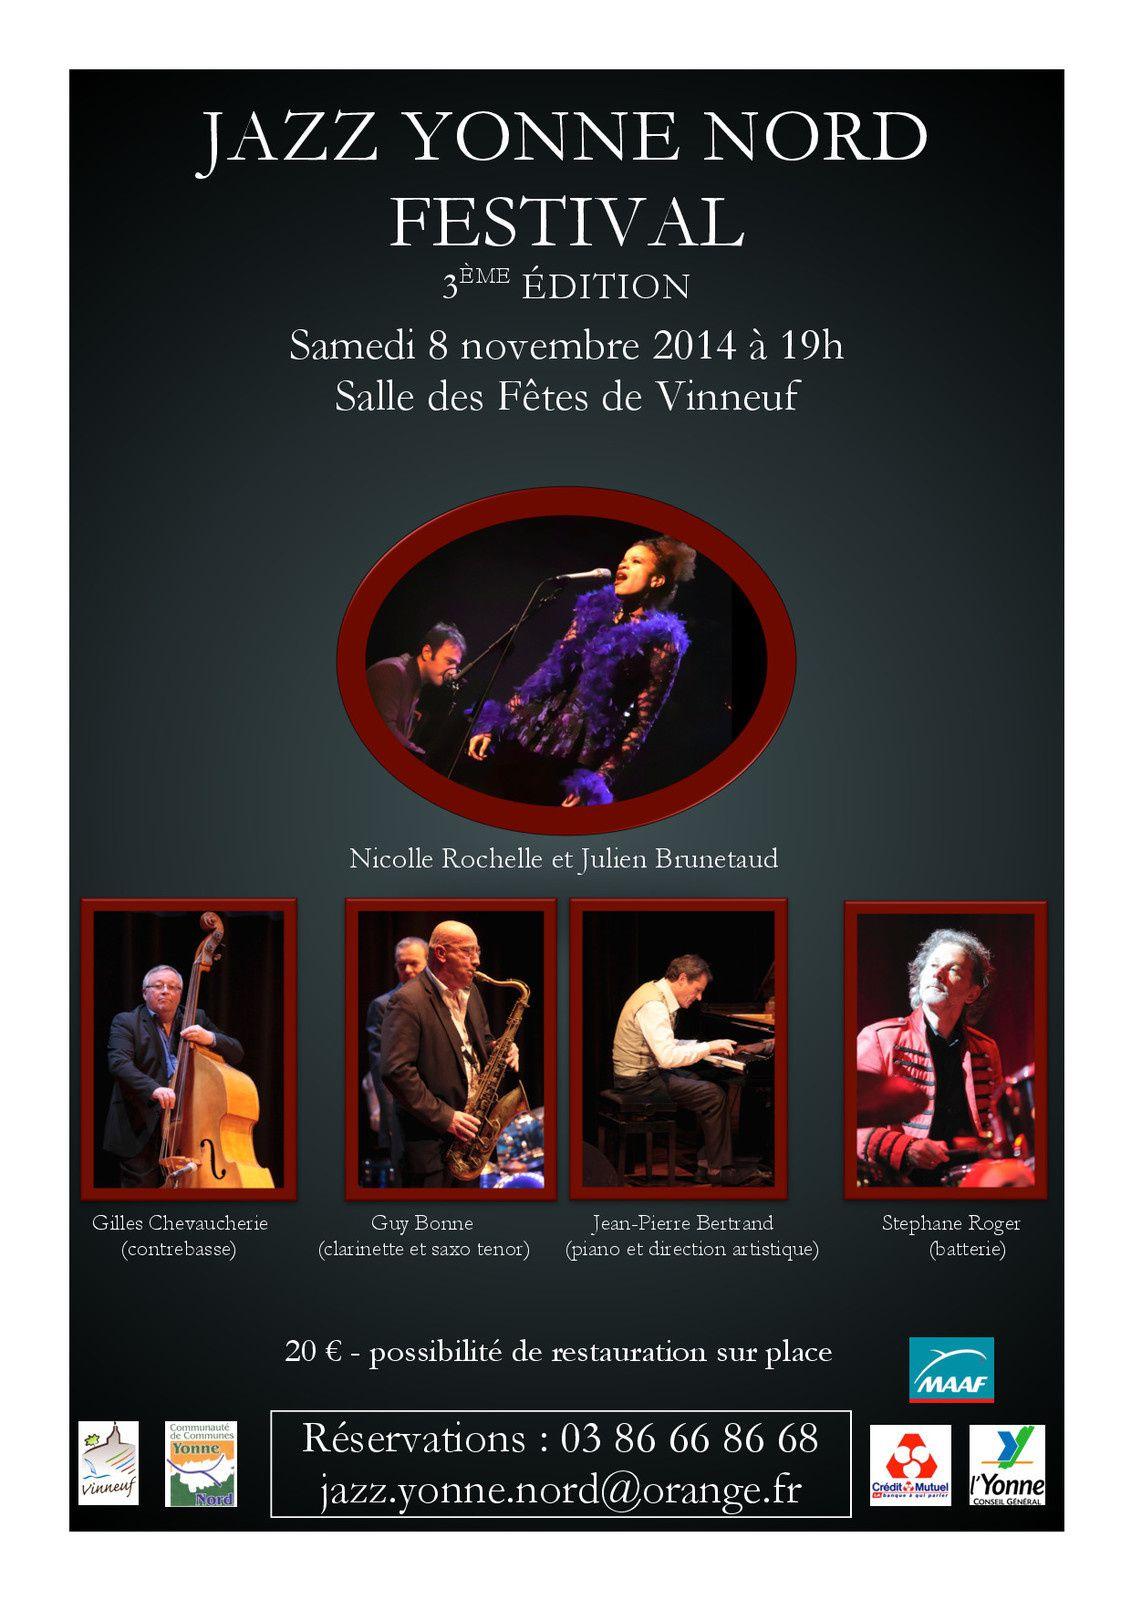 Jazz Yonne Nord